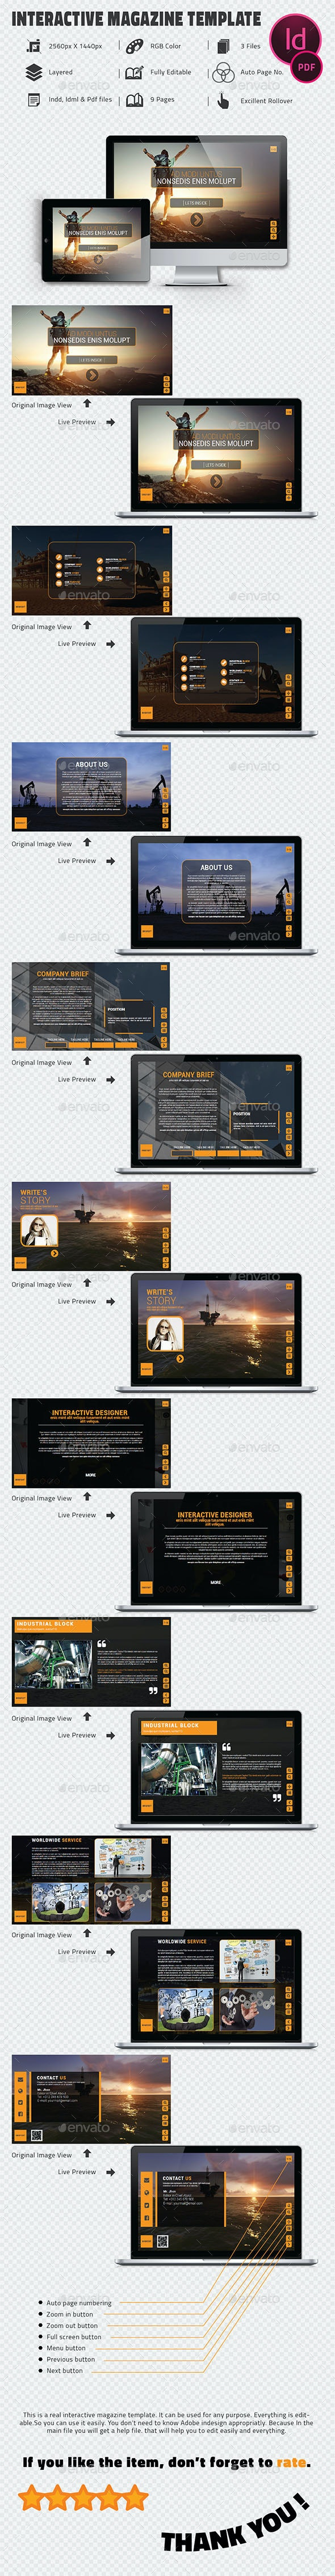 Interactive Pdf CorporateTemplate - Digital Magazines ePublishing